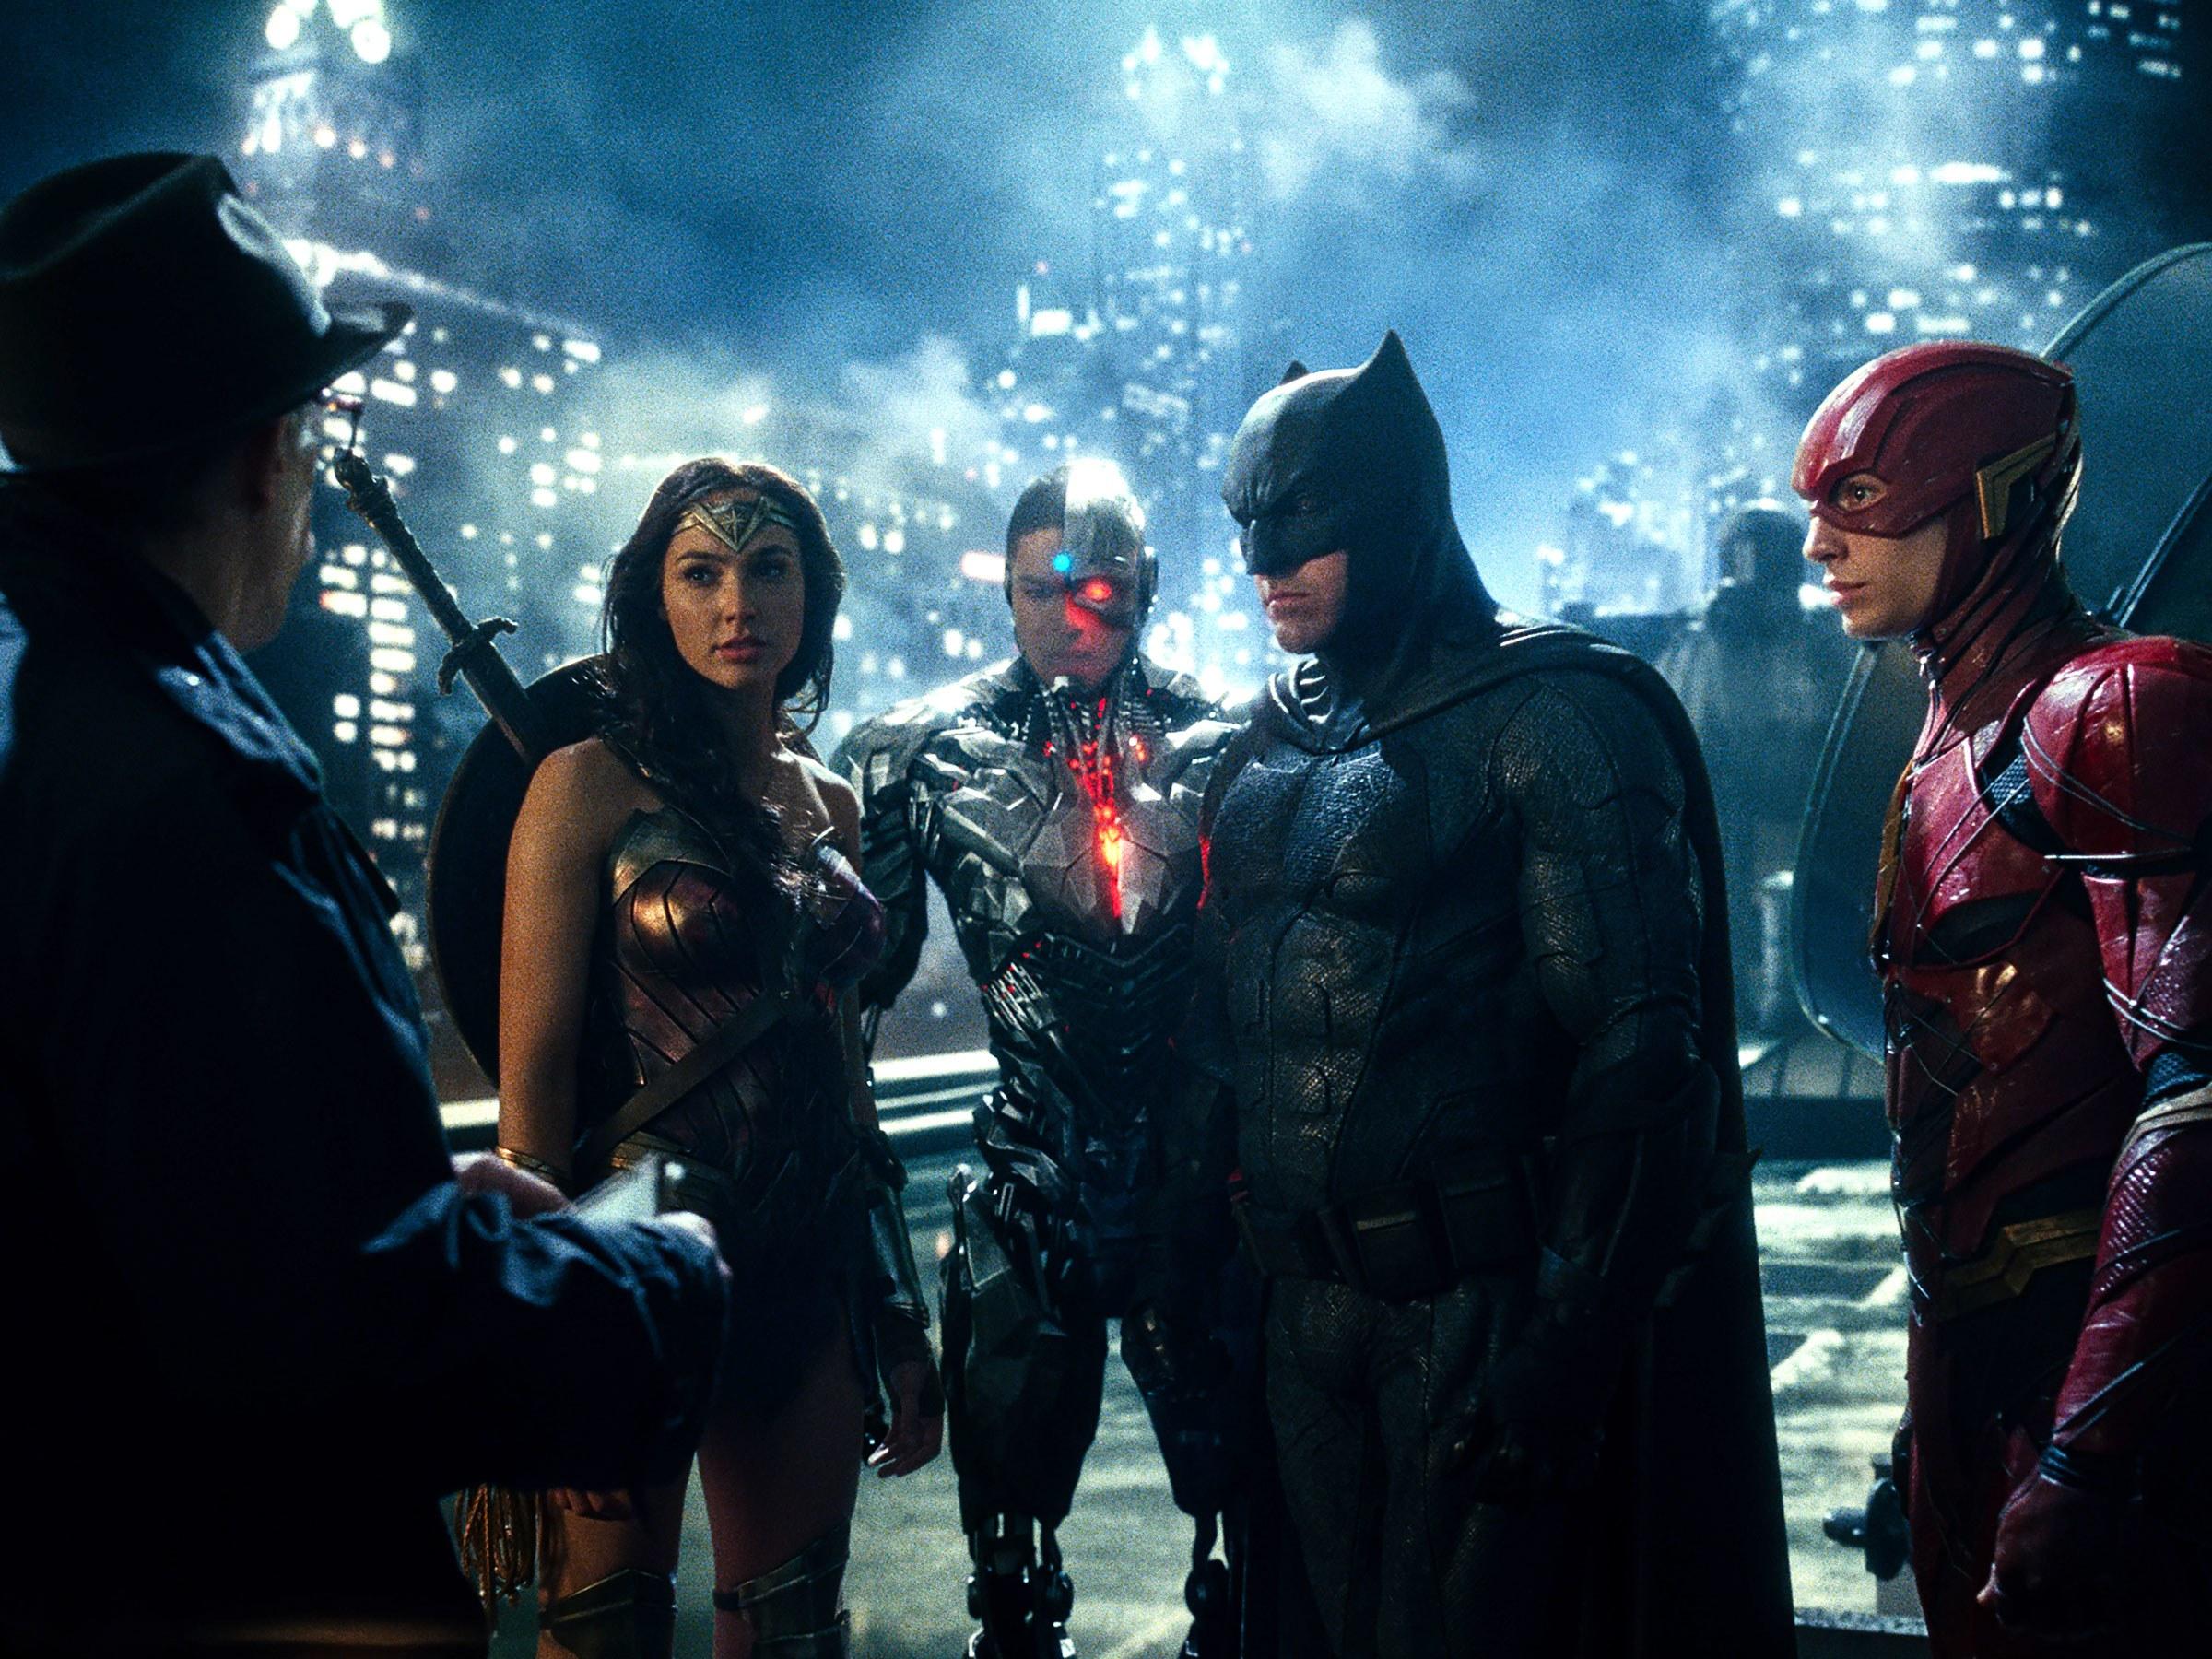 Justice-League-batsignal